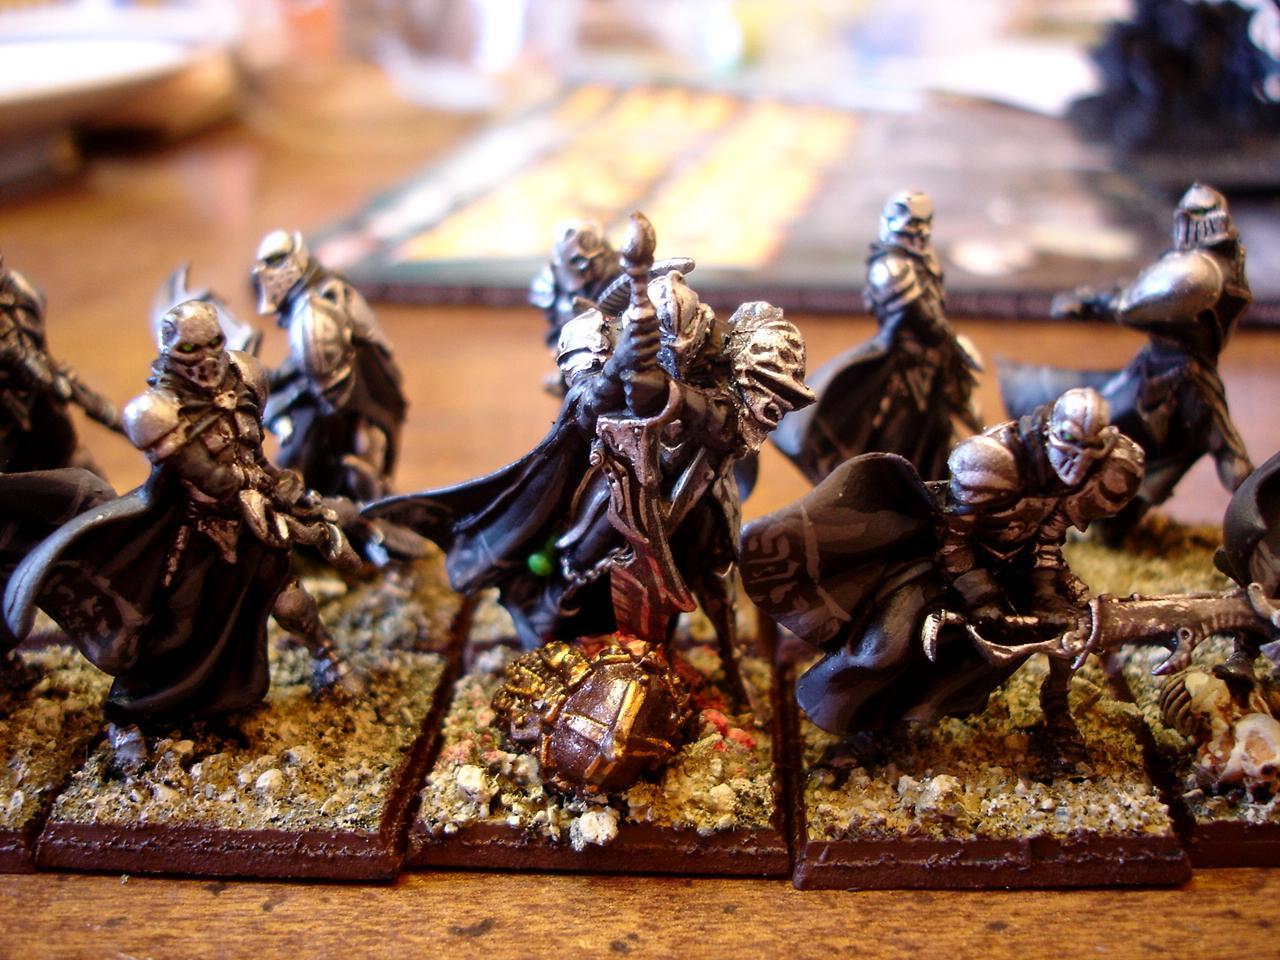 Confrontation, Dirz, Rackham, Warhammer Fantasy, Warriors Of Chaos